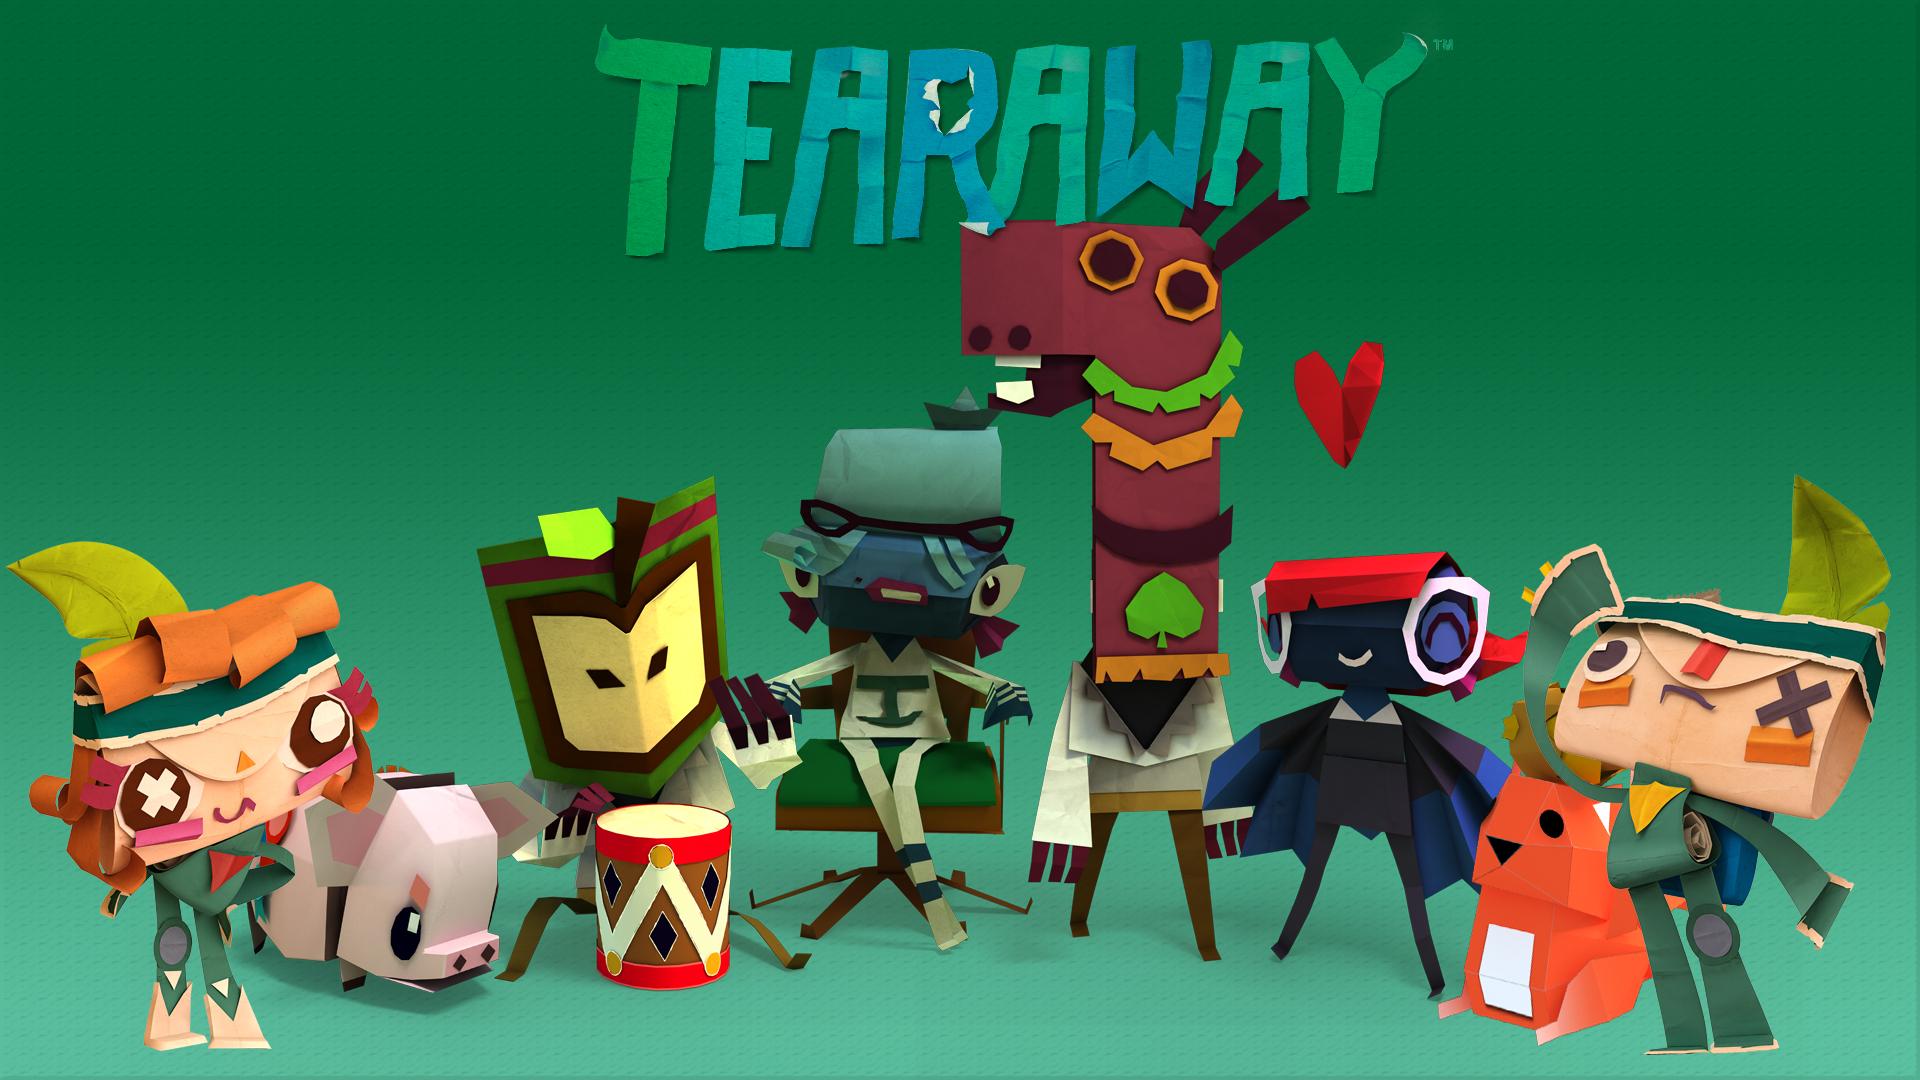 tearaway music